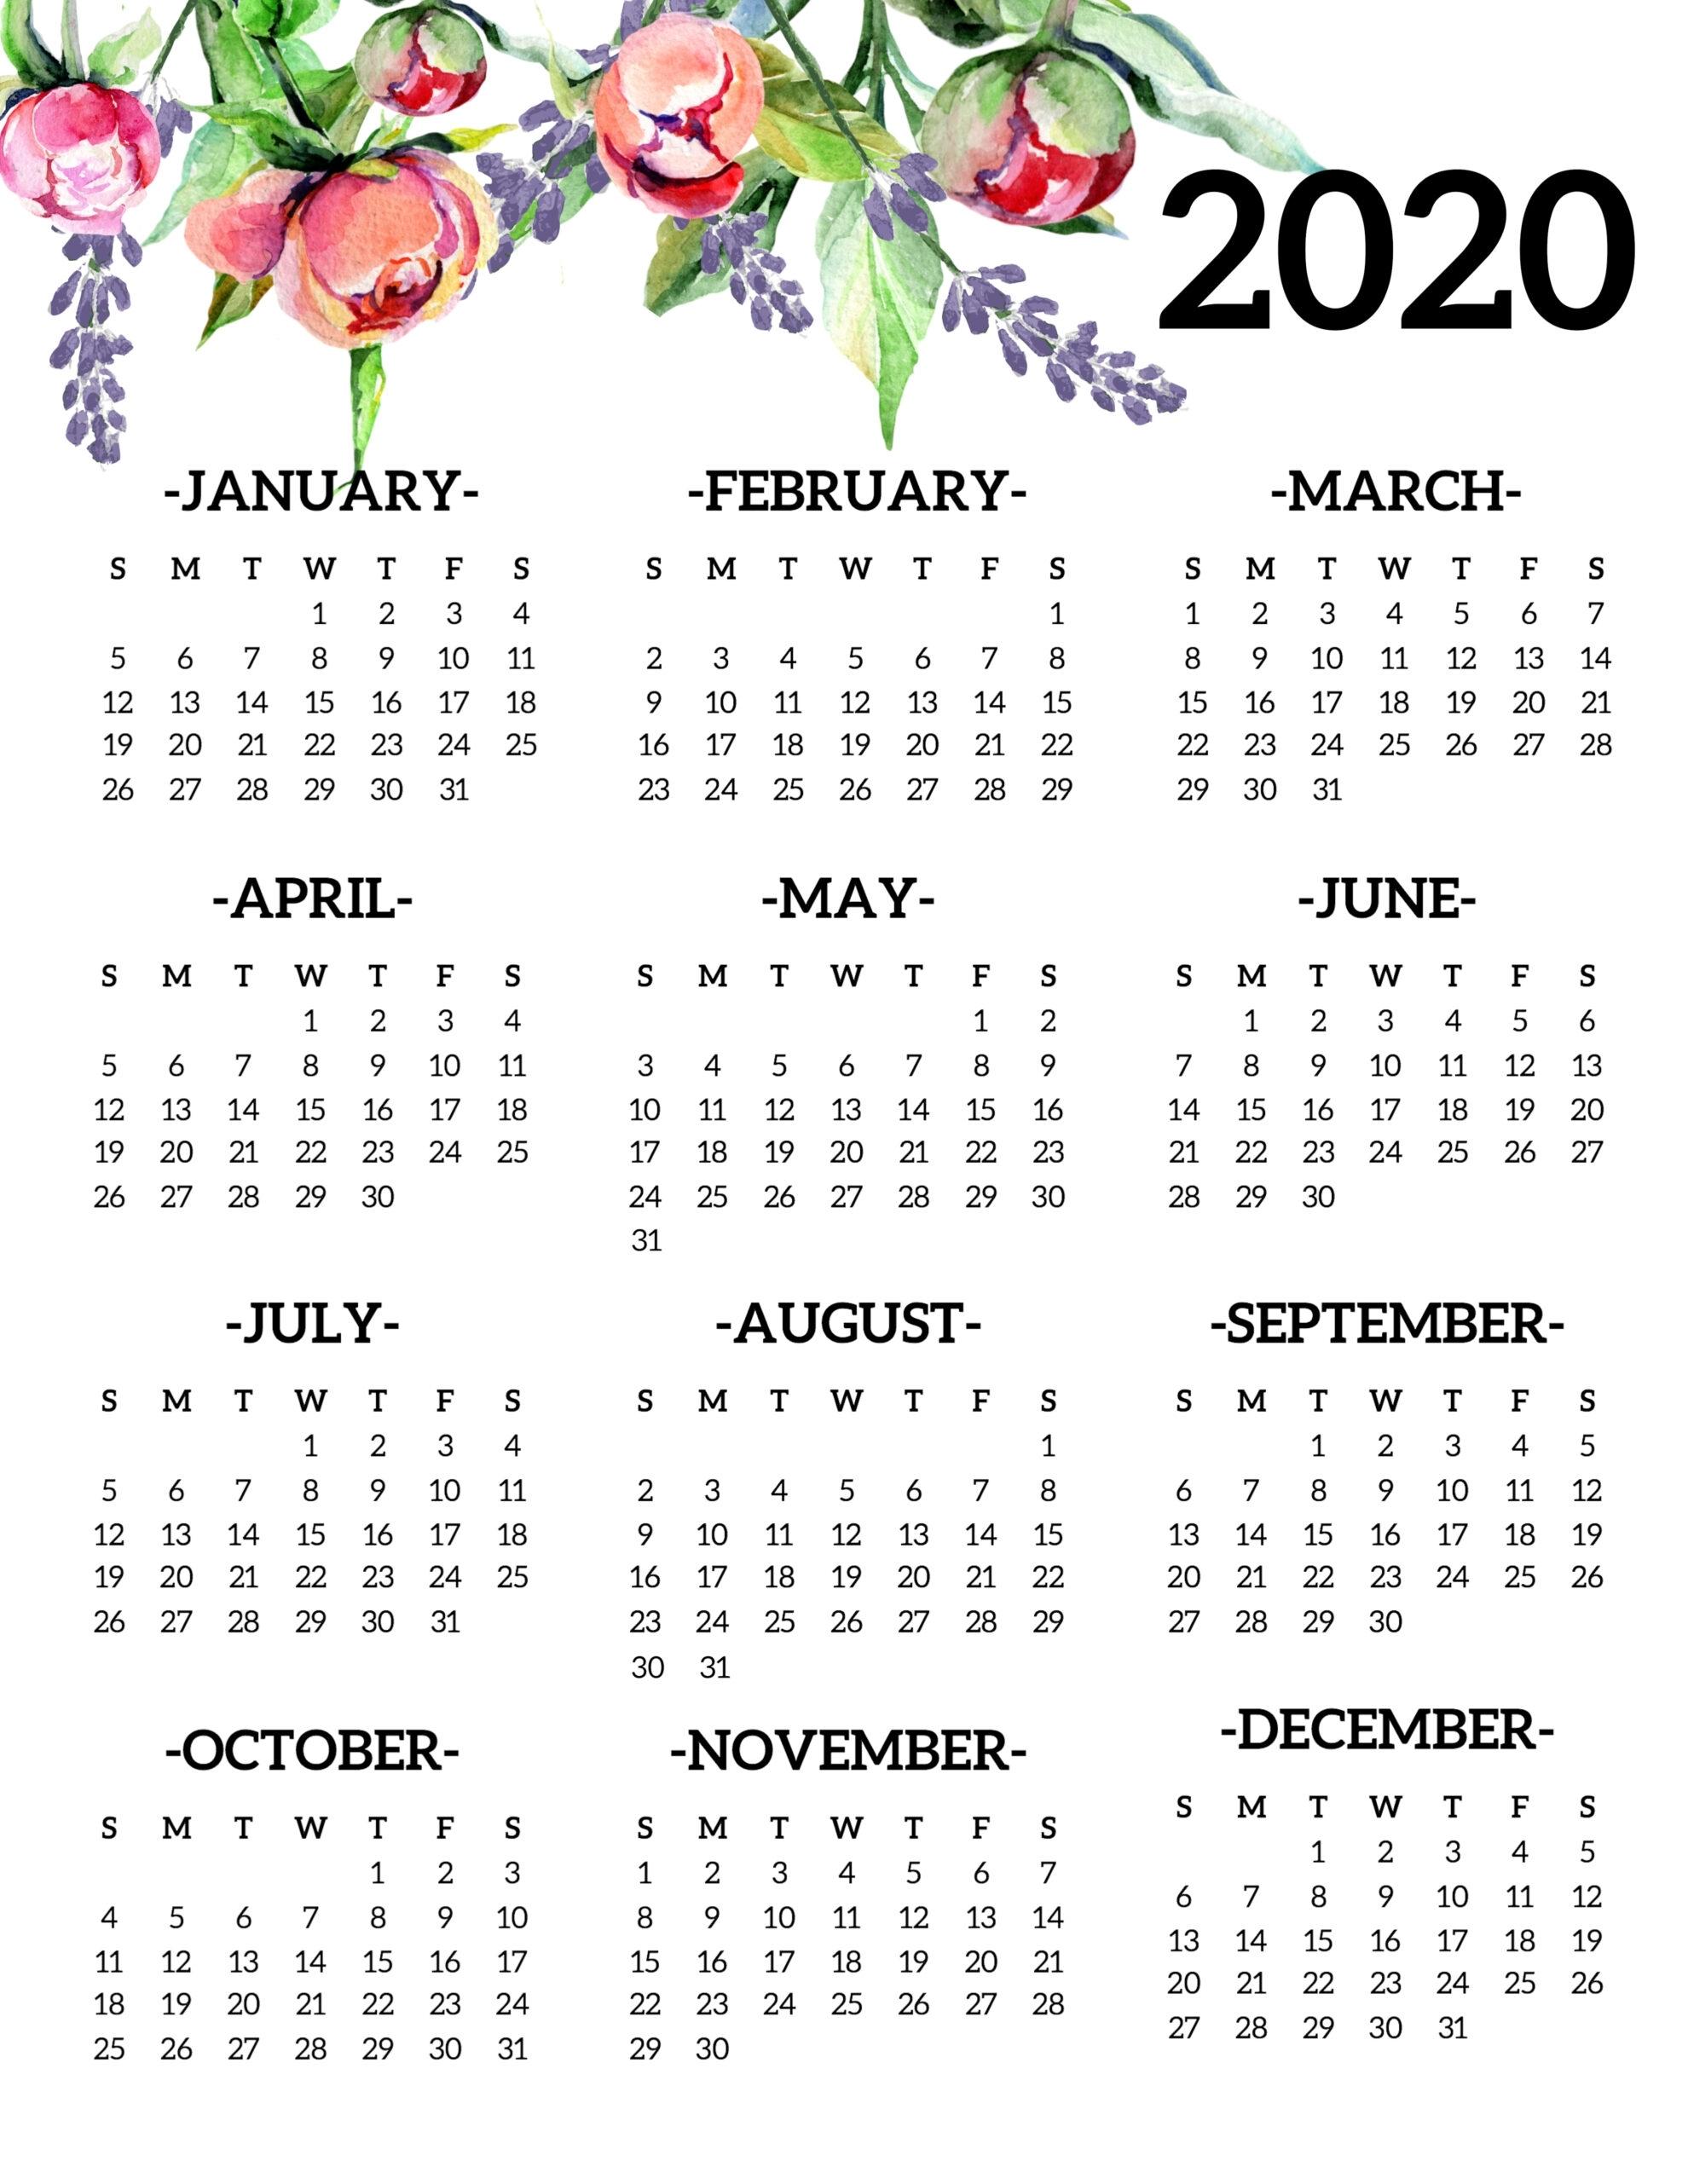 Calendar 2020 Printable With Holidays (Pdf, Word, Excel